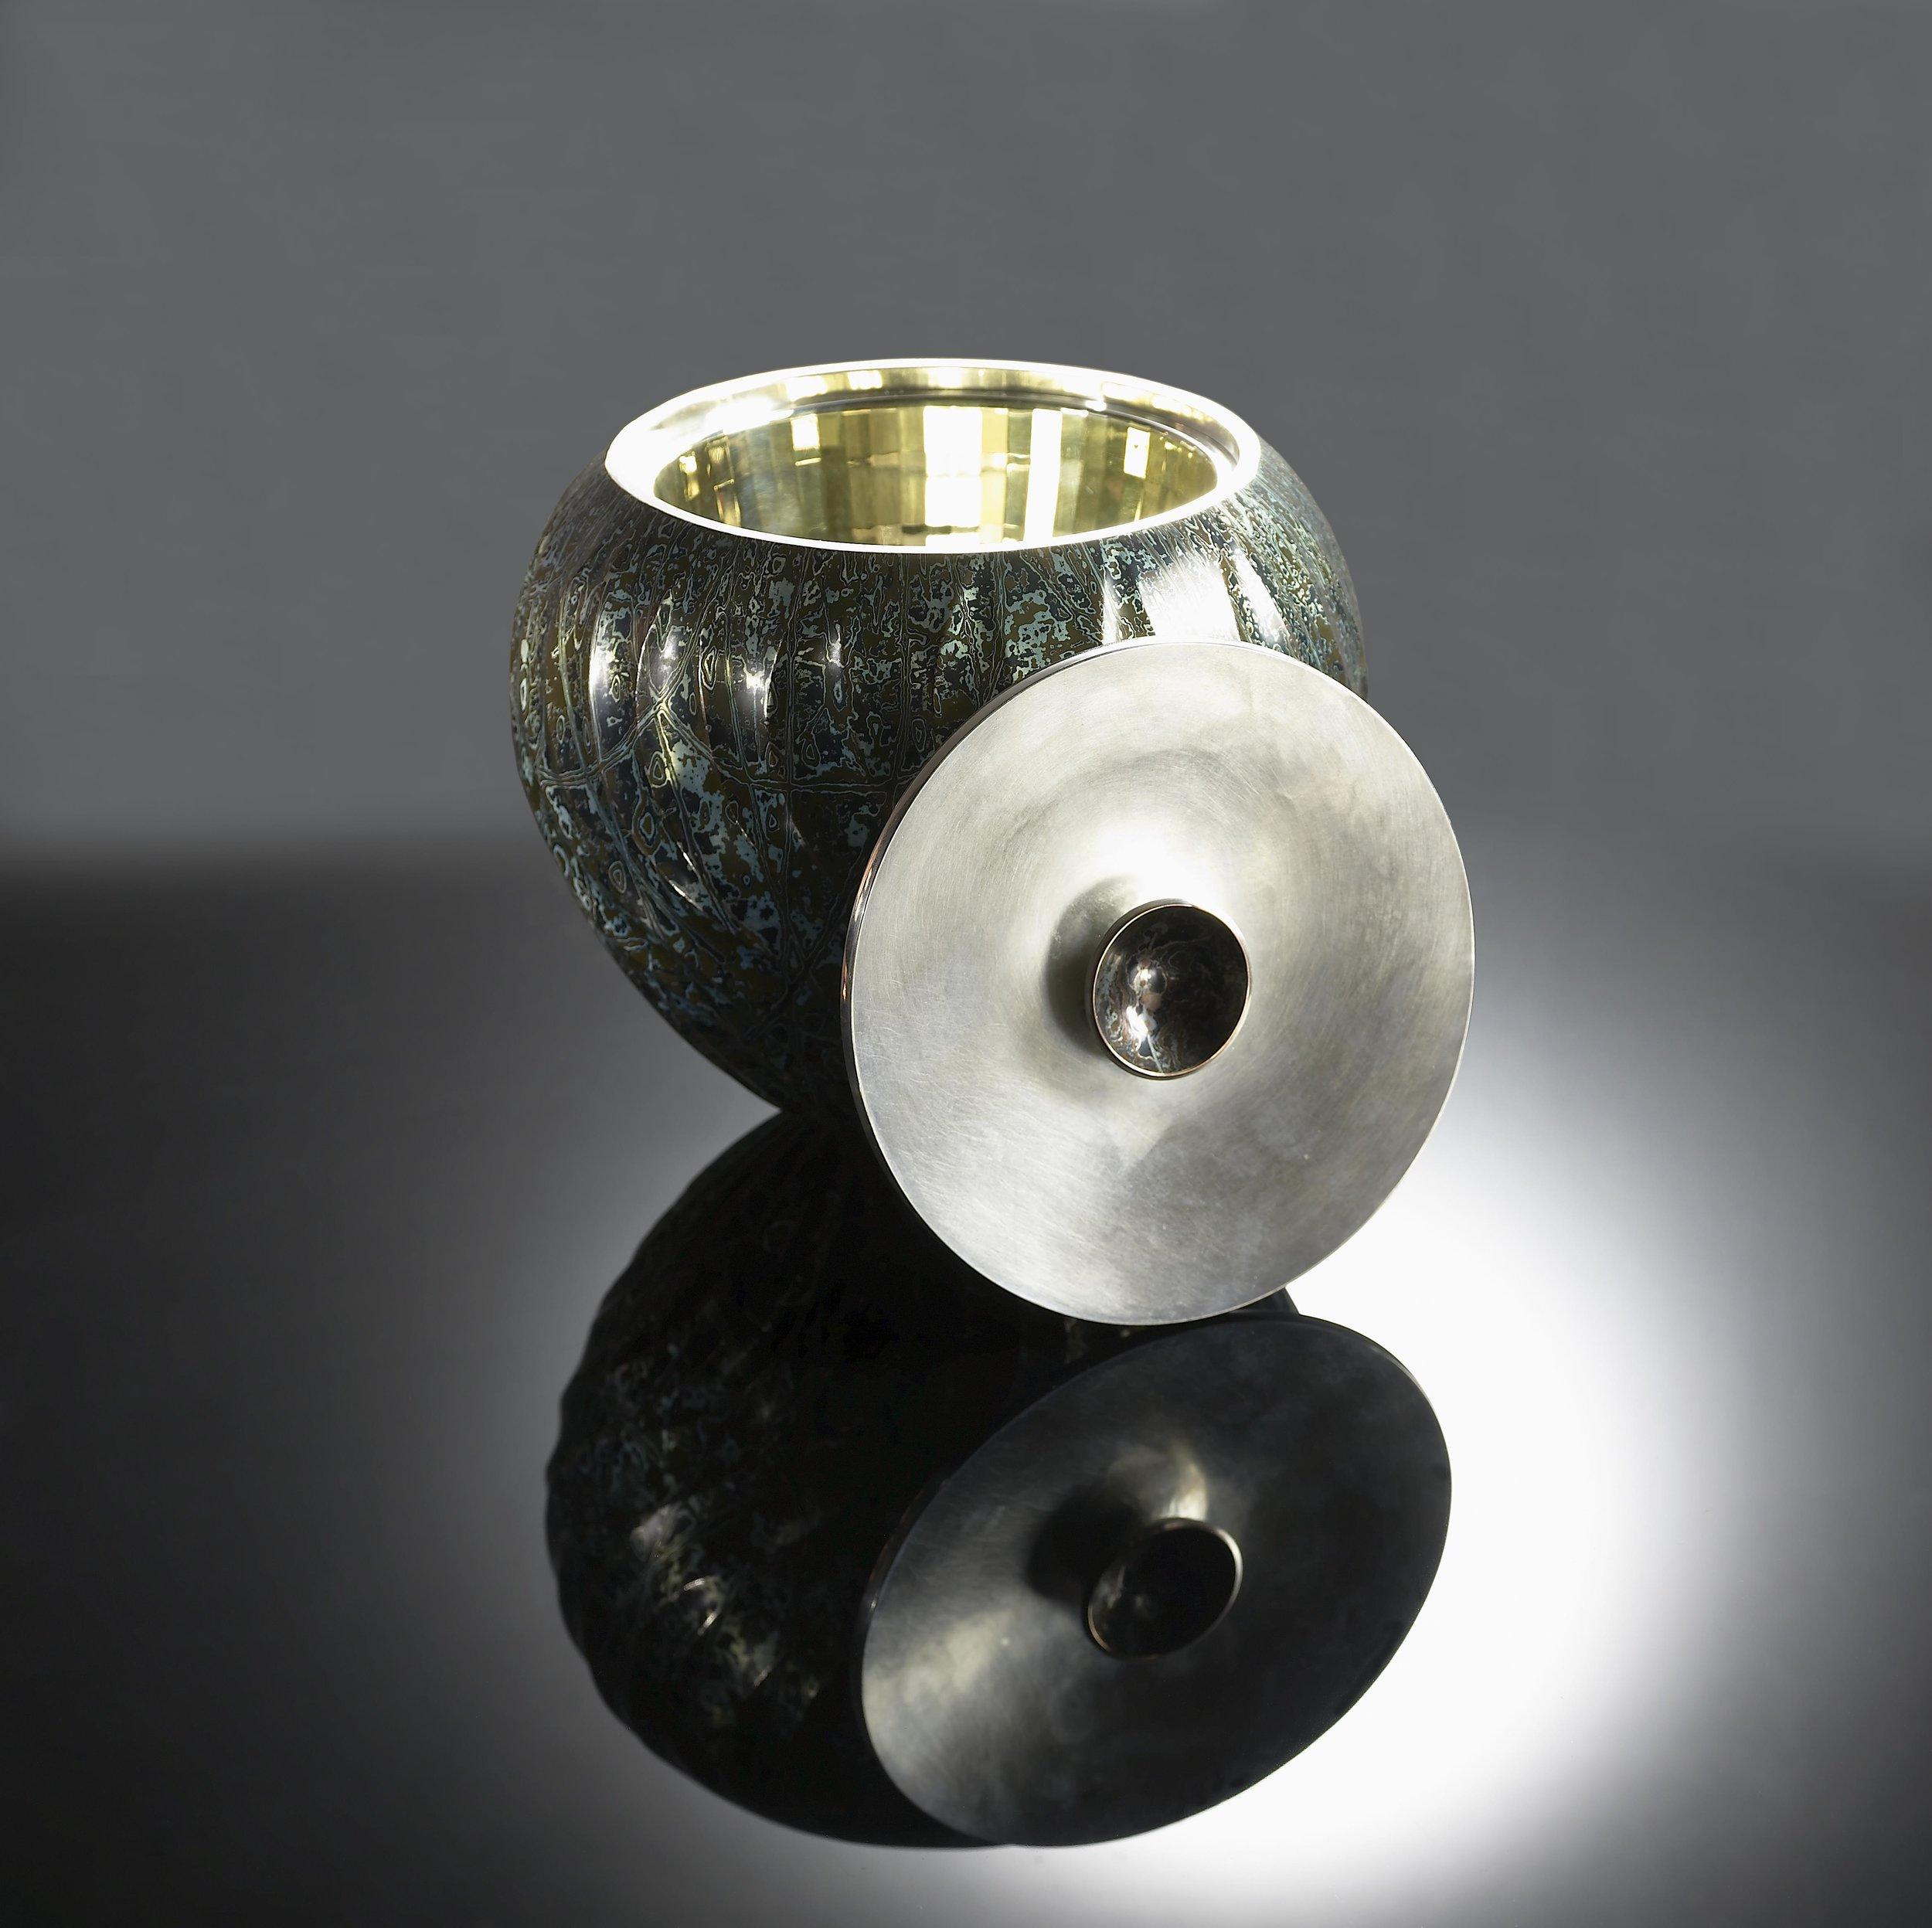 2011-SBDA-Hollowware-1st Place (Grand Prize)-Wayne Meeten-4_lg.jpg